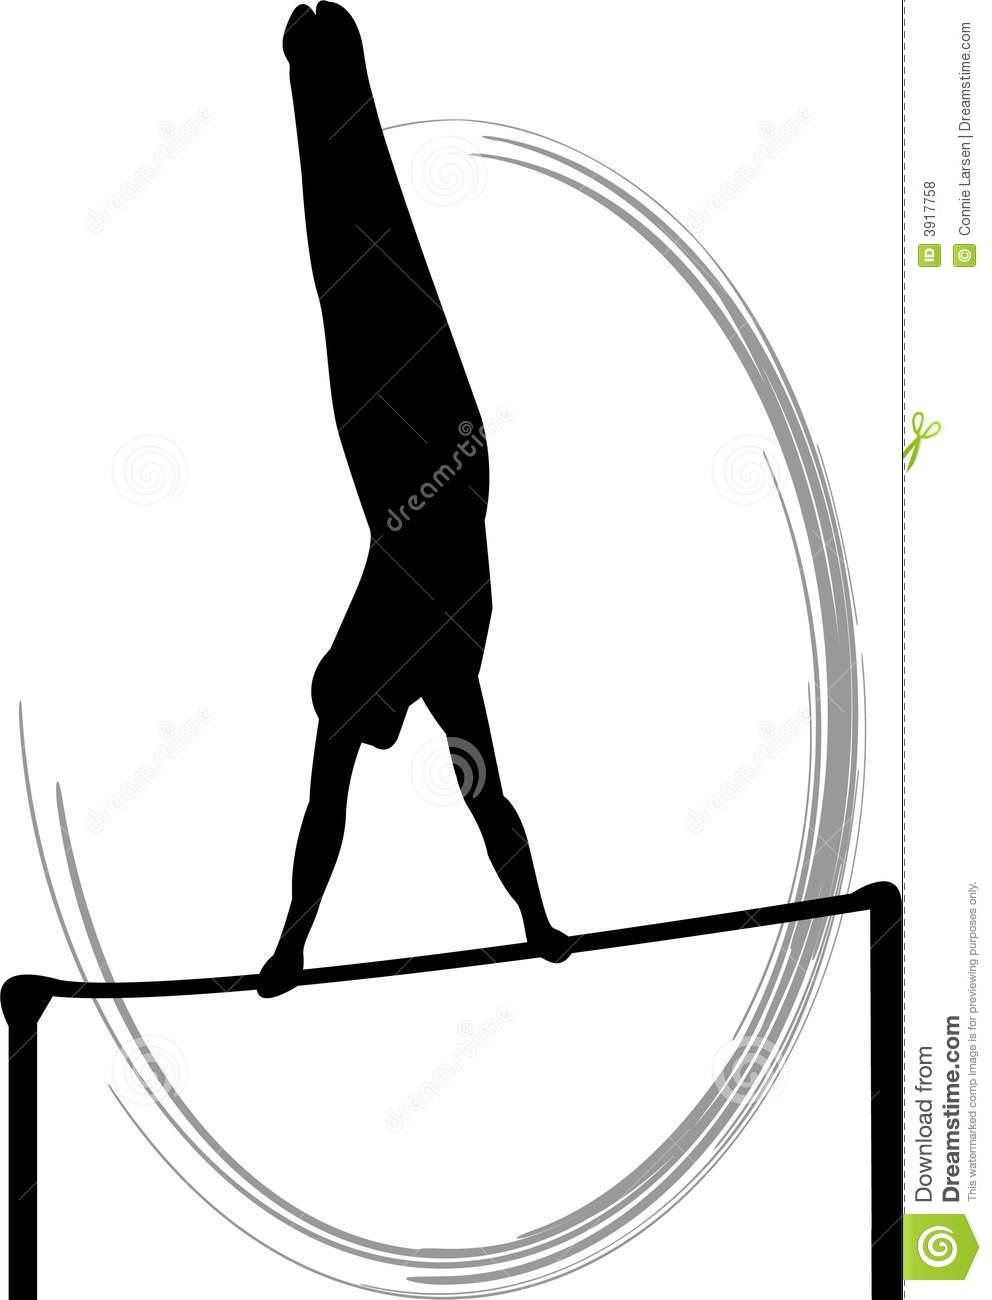 Gymnastics clipart silhouette vault clipart transparent download Gymnastics Silhouette Clipart - Clipart Kid clipart transparent download